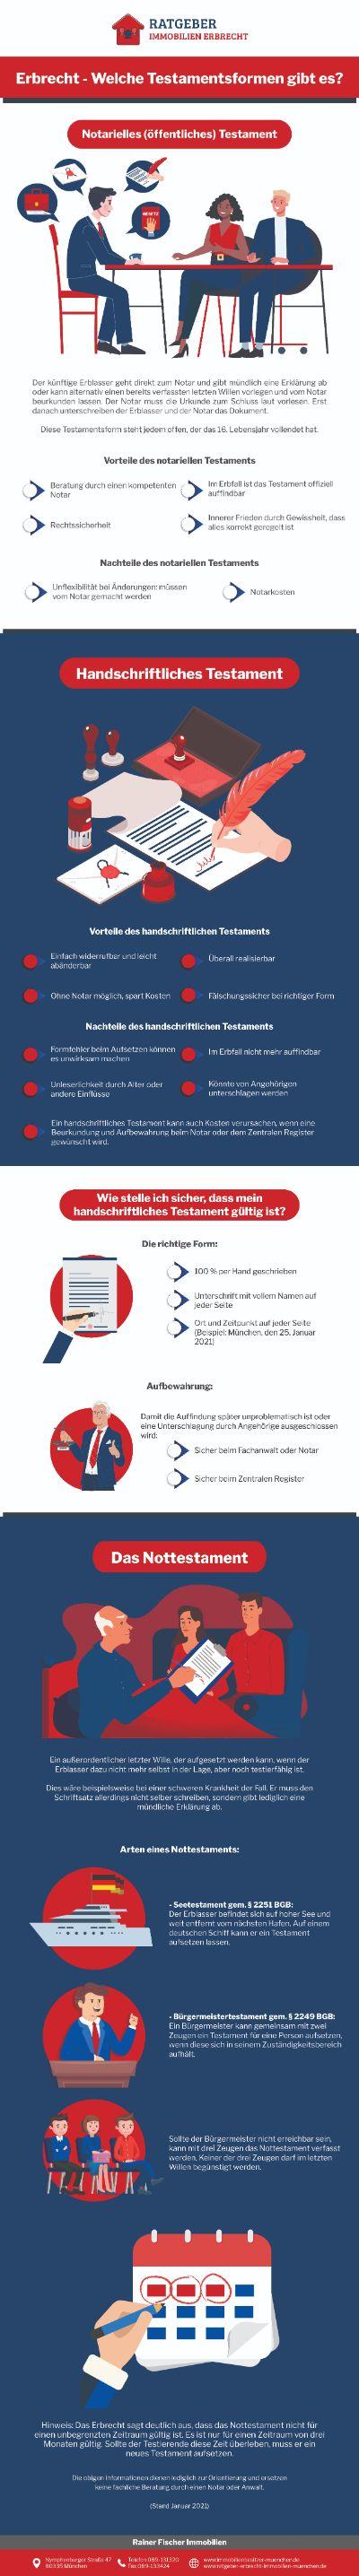 Ratgeber Erbrecht Infografik - Erbrecht: Welche Testamentsformen Gibt Es?